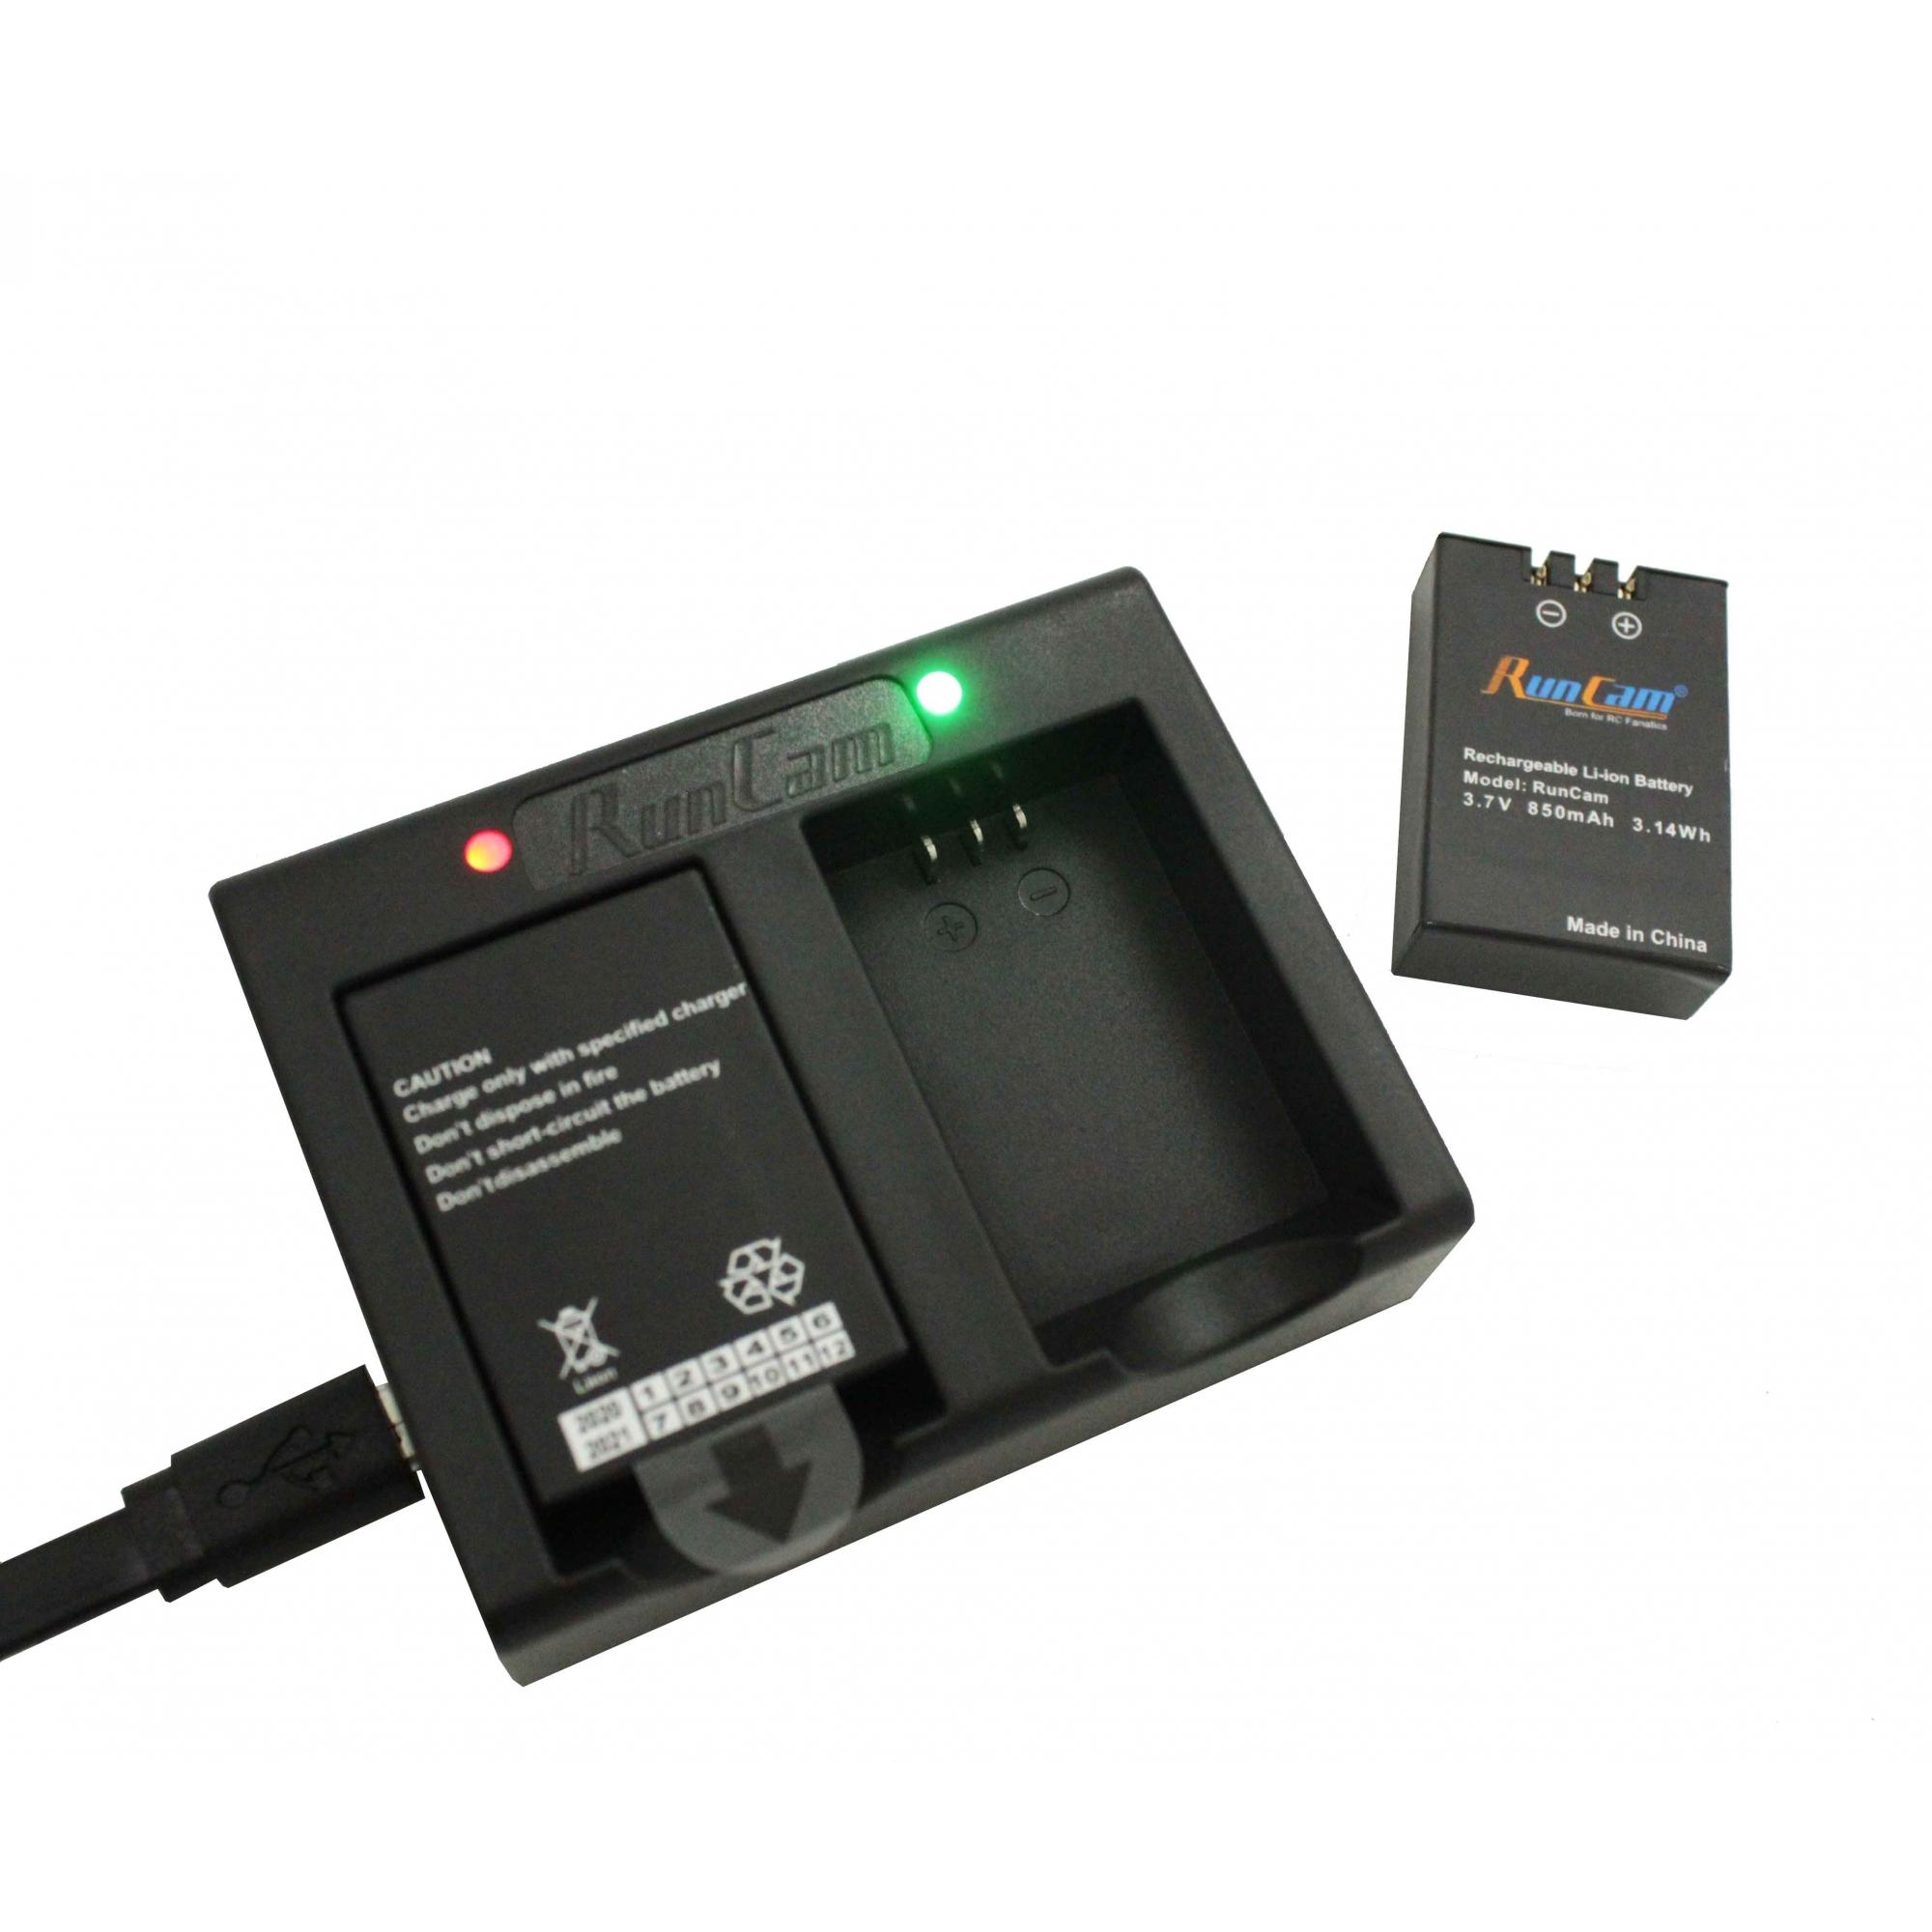 Carregador Duplo de Bateria Runcam